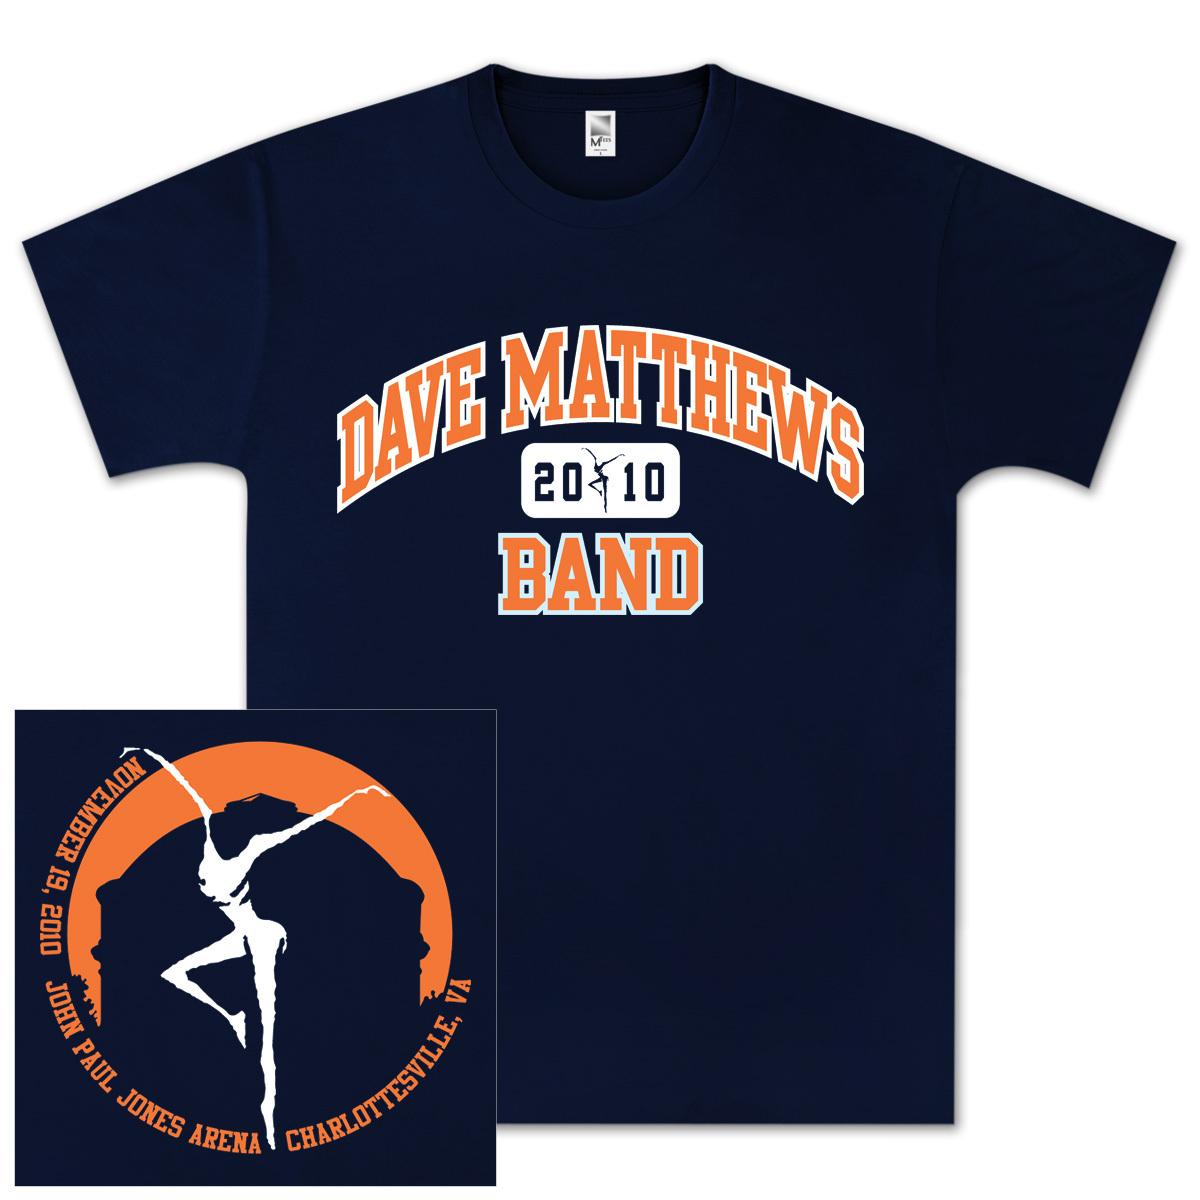 Dave Matthews Band Shared | DMB Shared - Download cds ...